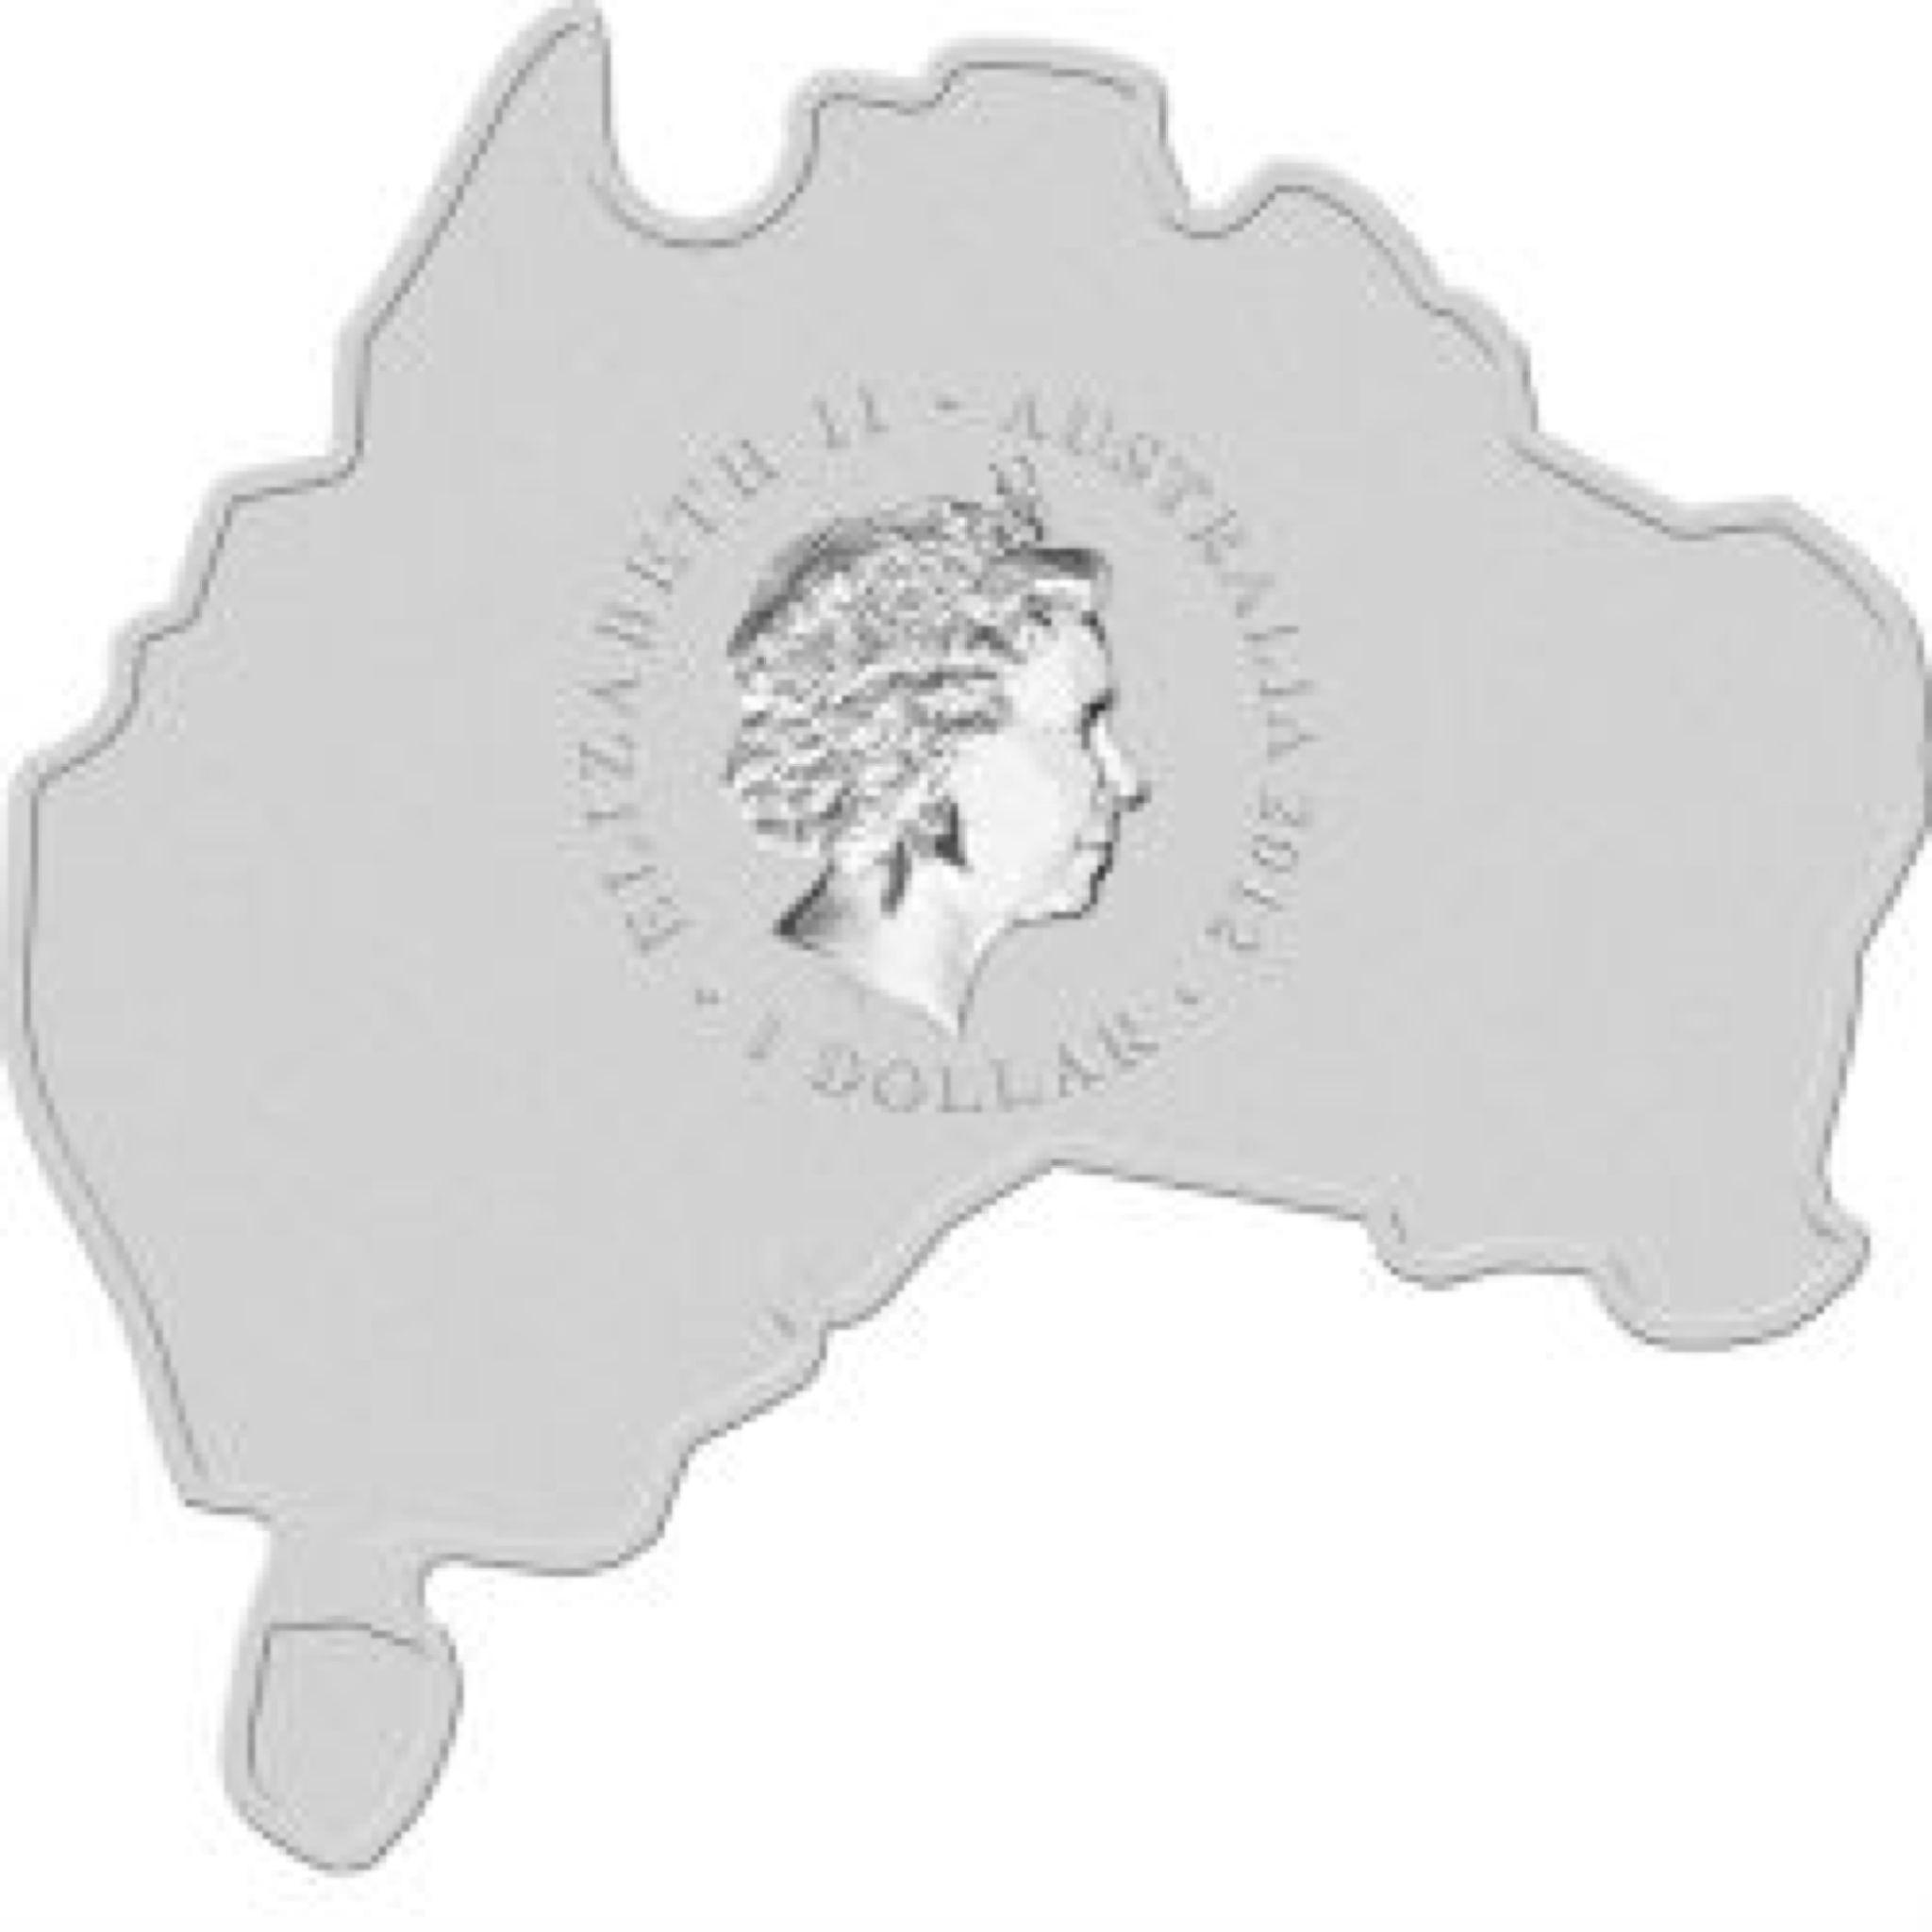 2012 Emu 1oz Map Shape Coin - $1 (2012) back image (back cover, second image)